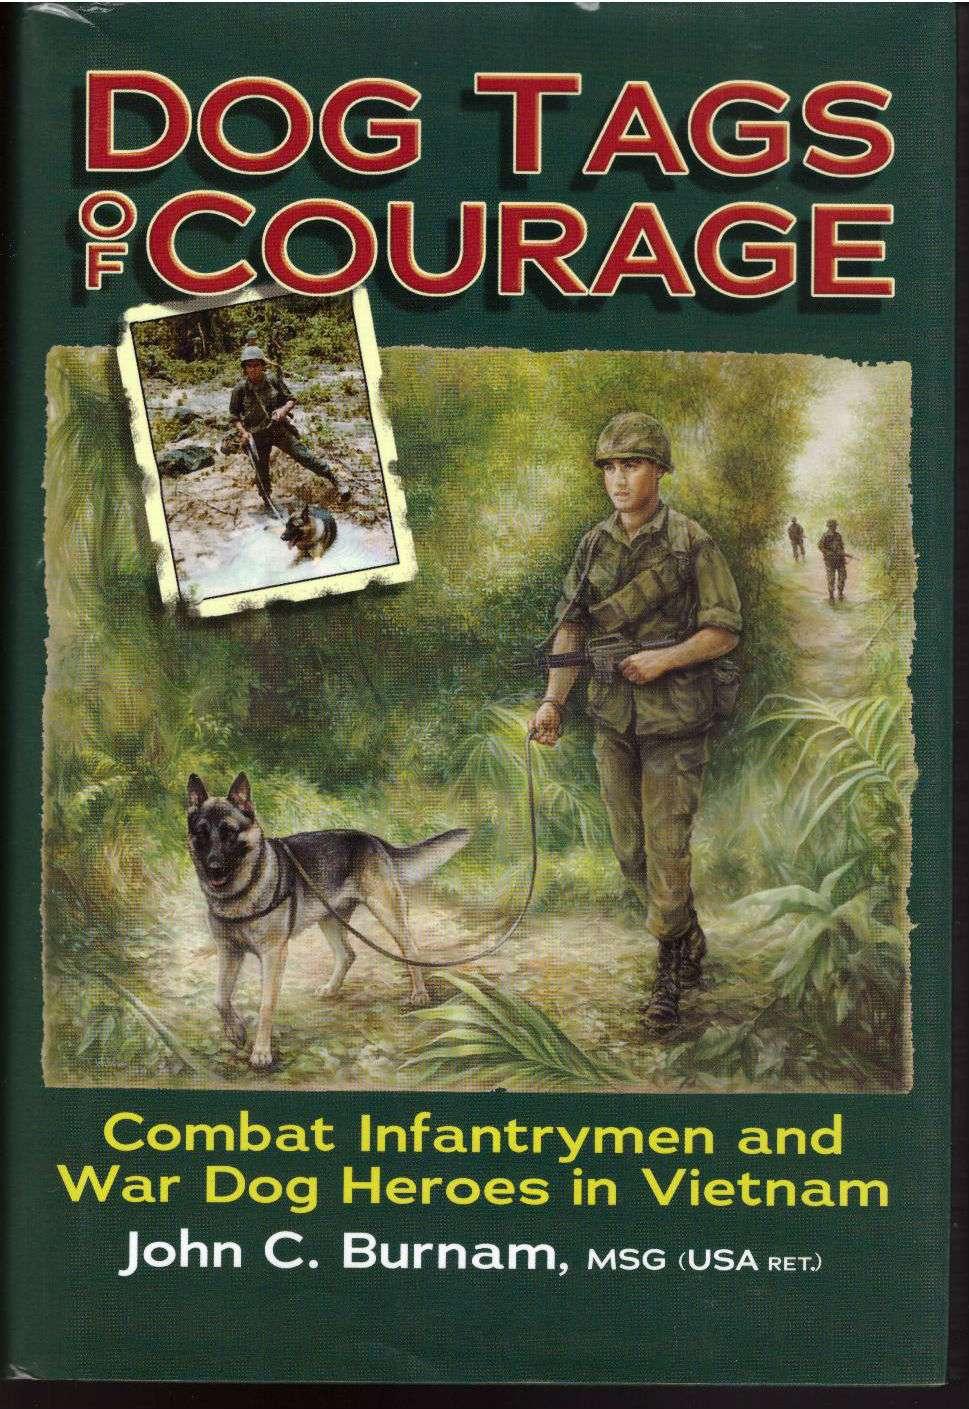 Dog Tags of Courage: Combat Infantrymen And War Dog Heroes in Vietnam, John C. Burnam